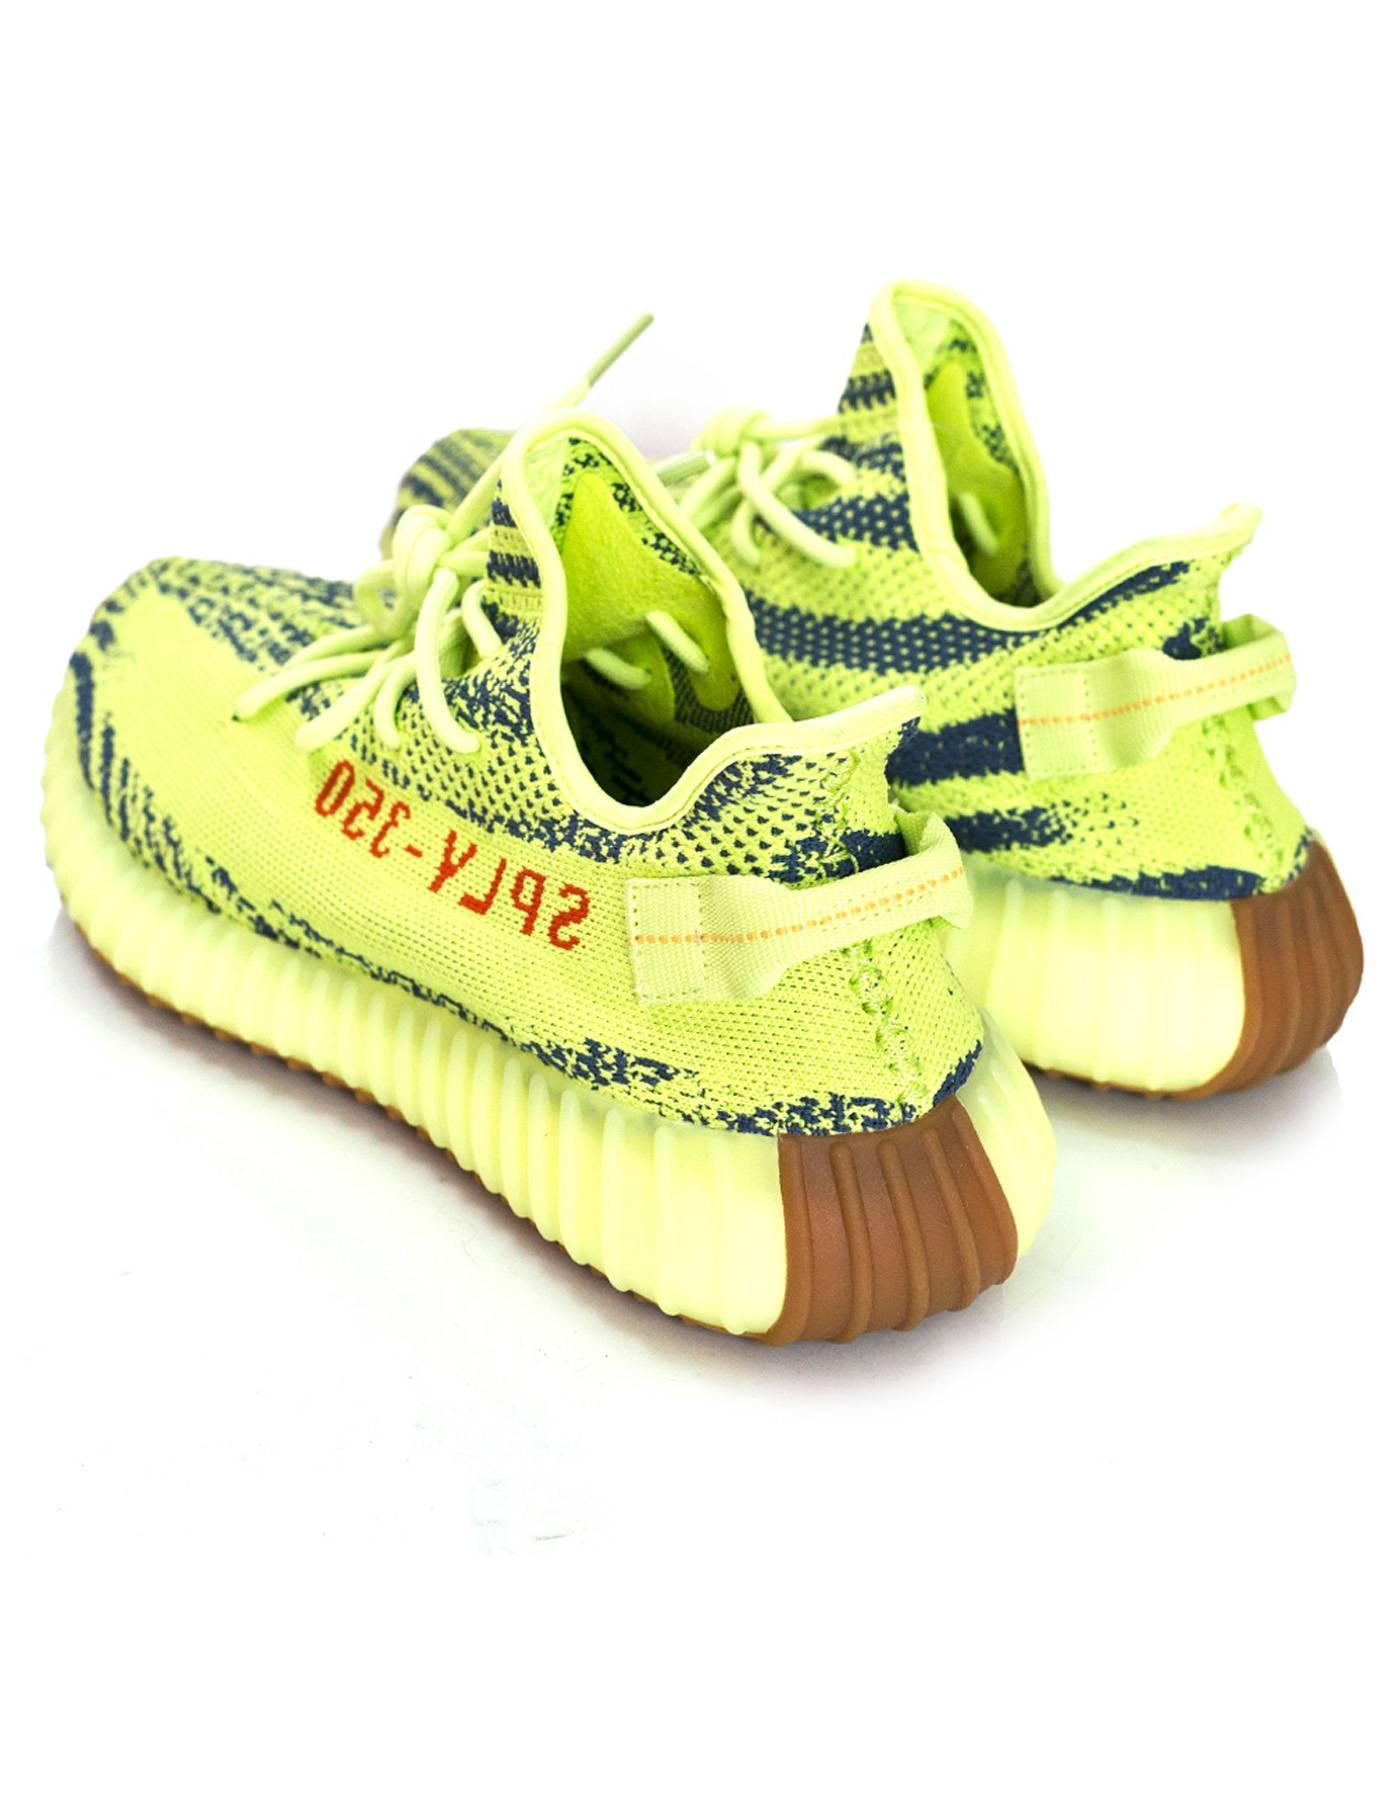 4ec2178cc1e ... new zealand adidas x kanye west yeezy boost 350 v2 semi frozen yellow  2.0 sneakers sz ...